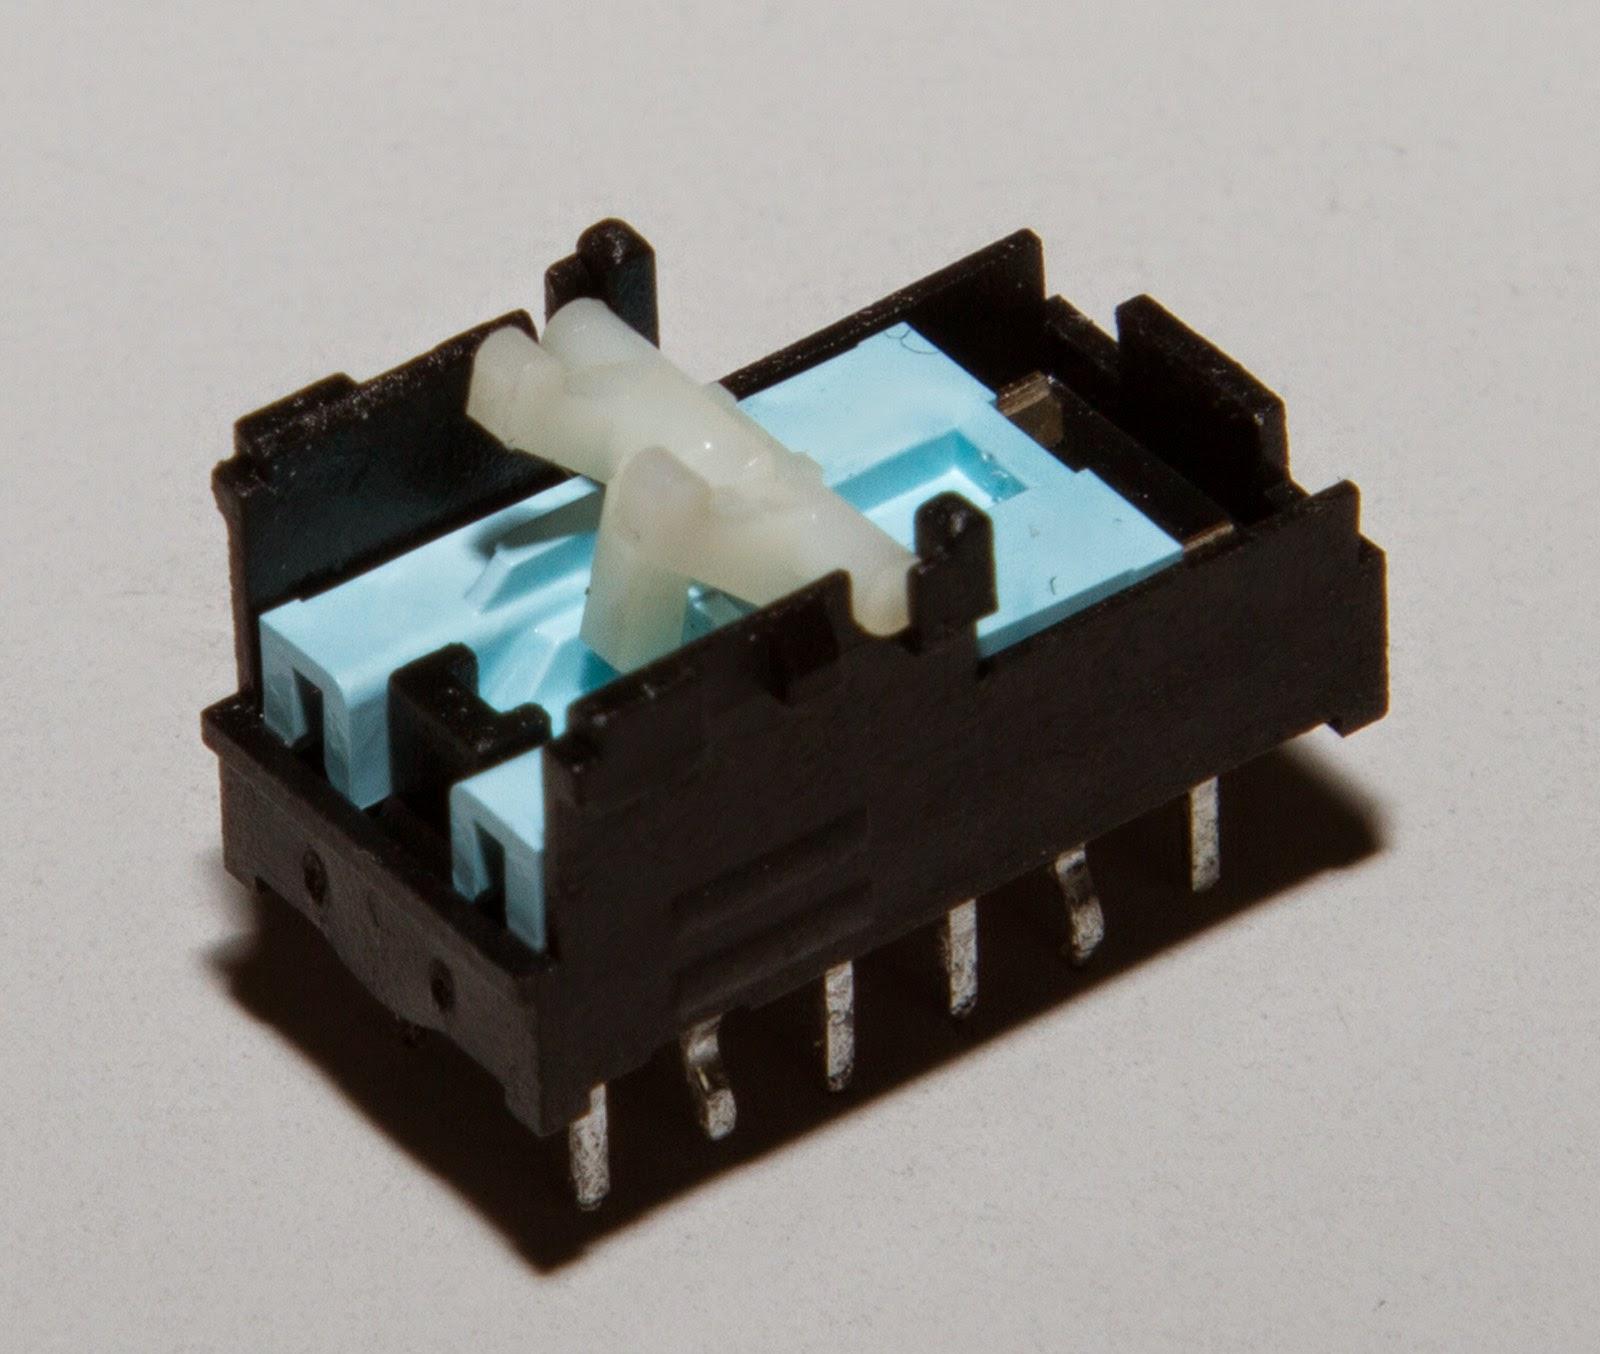 Joe\'s Technology Blog: Onkyo A-8650 Refresh (German)